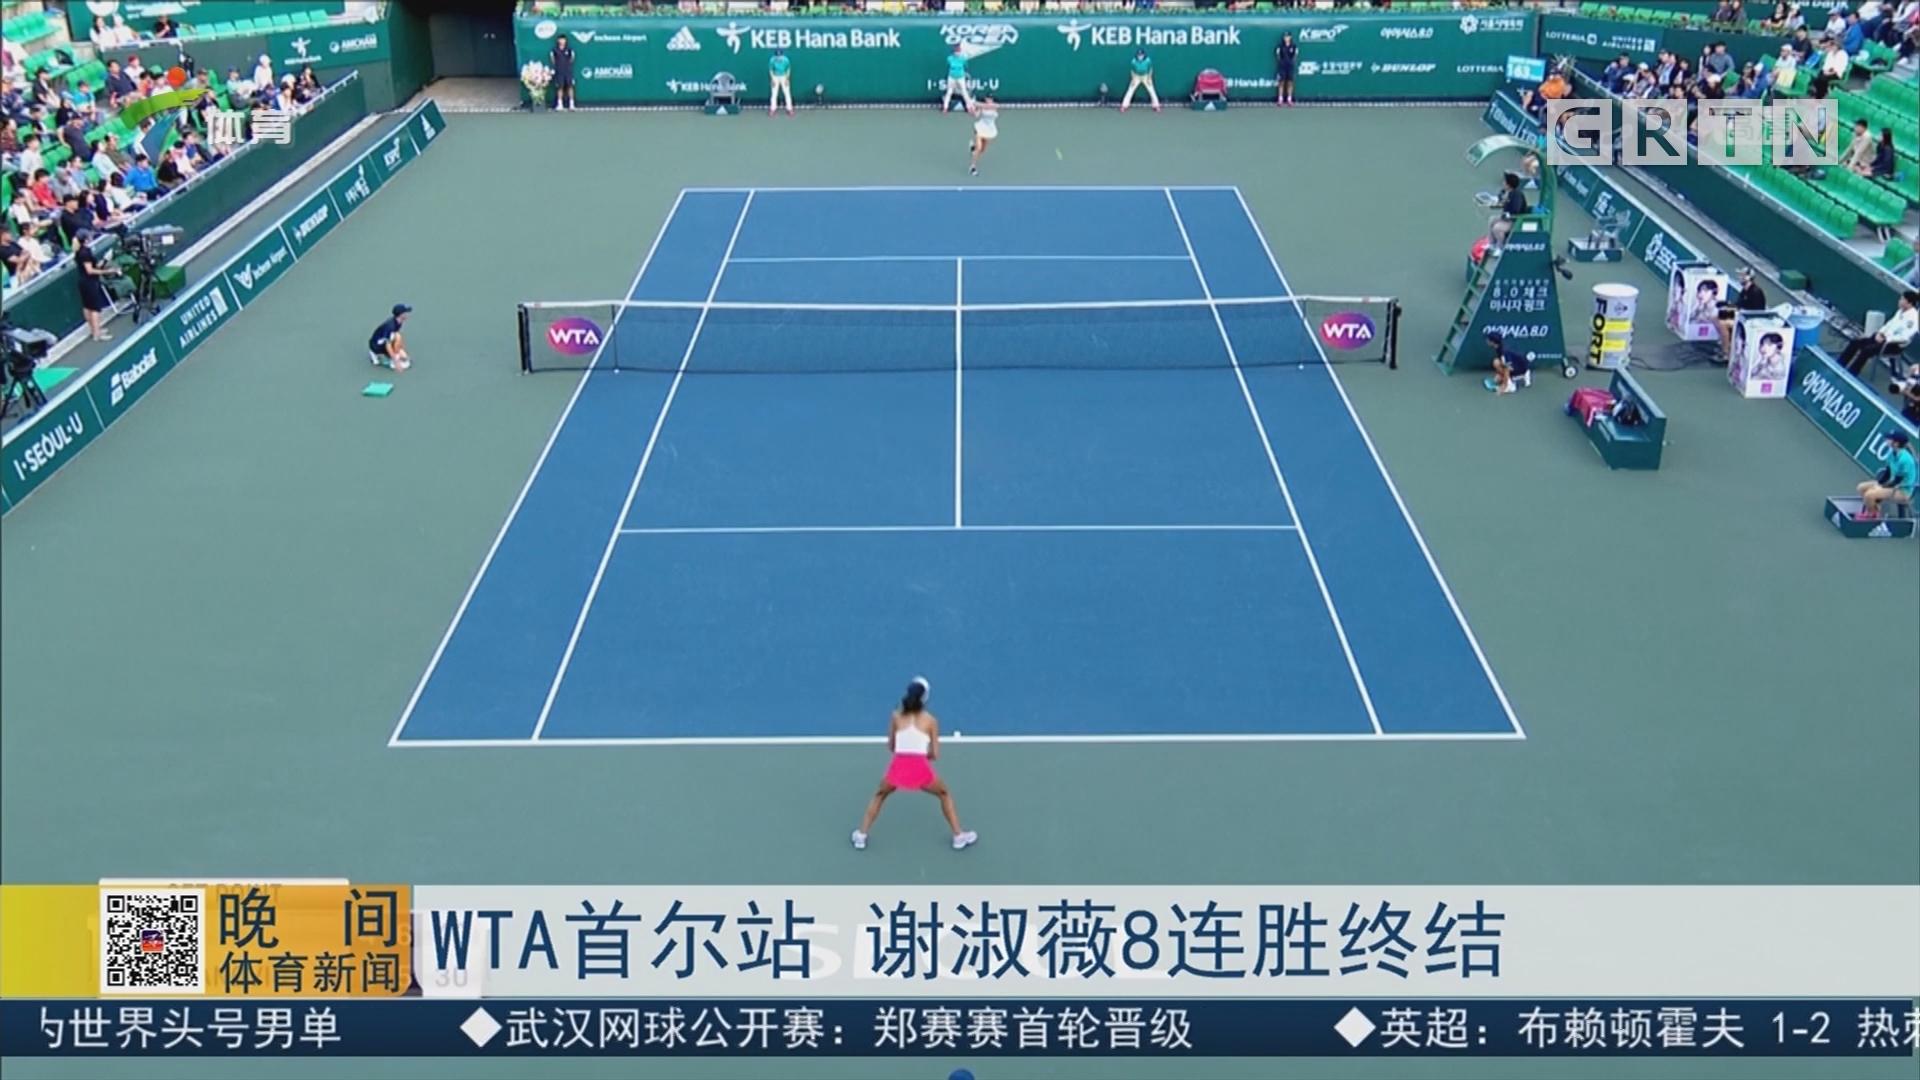 WTA首尔站 谢淑薇8连胜终结